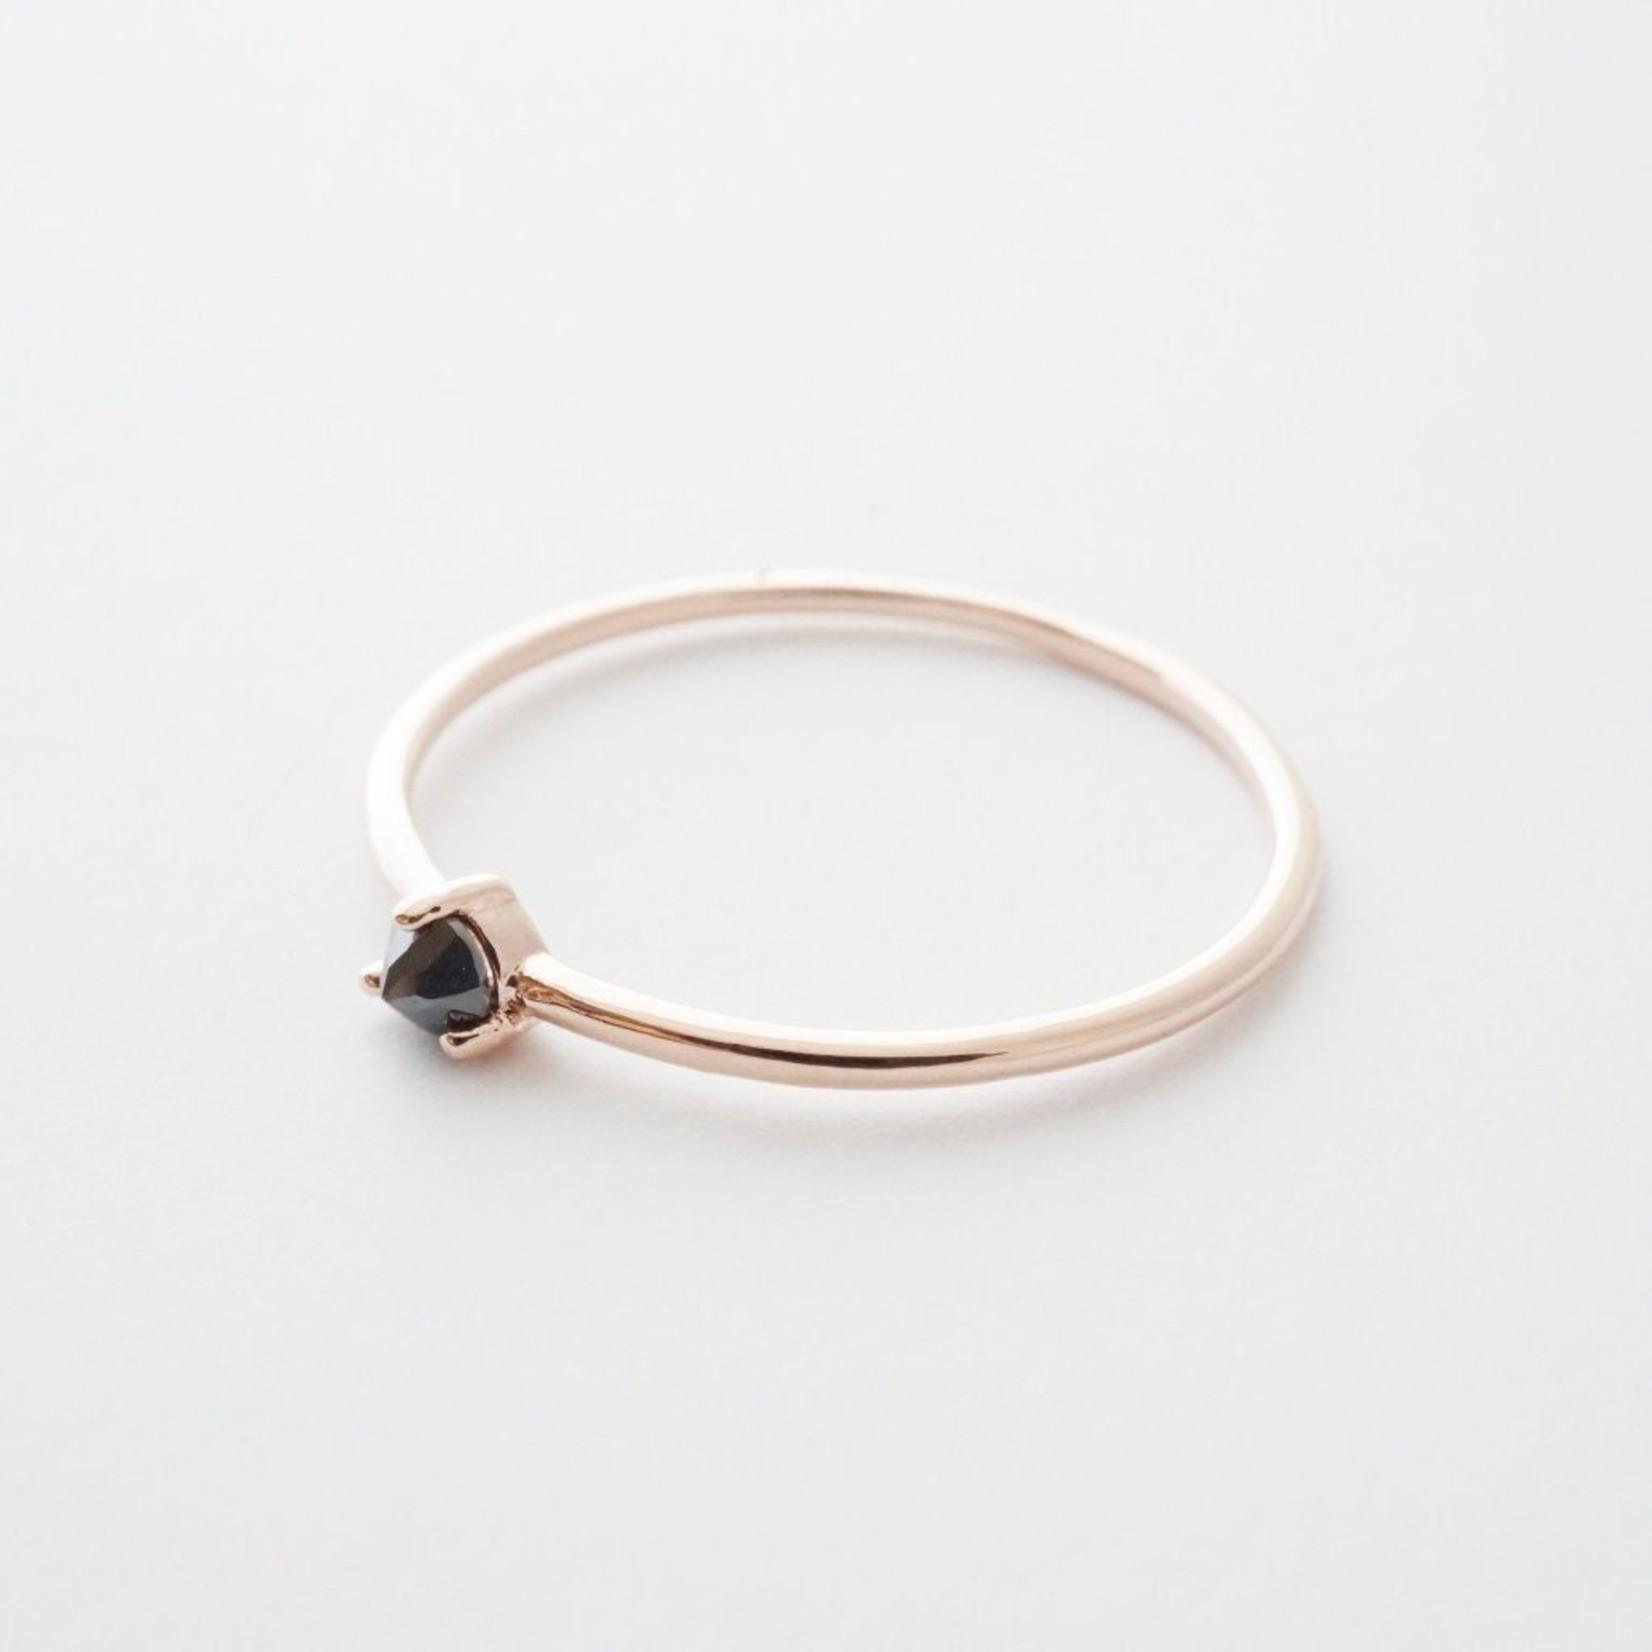 Honeycat Jewelry Honeycat Point Solitaire Ring IRON ORE